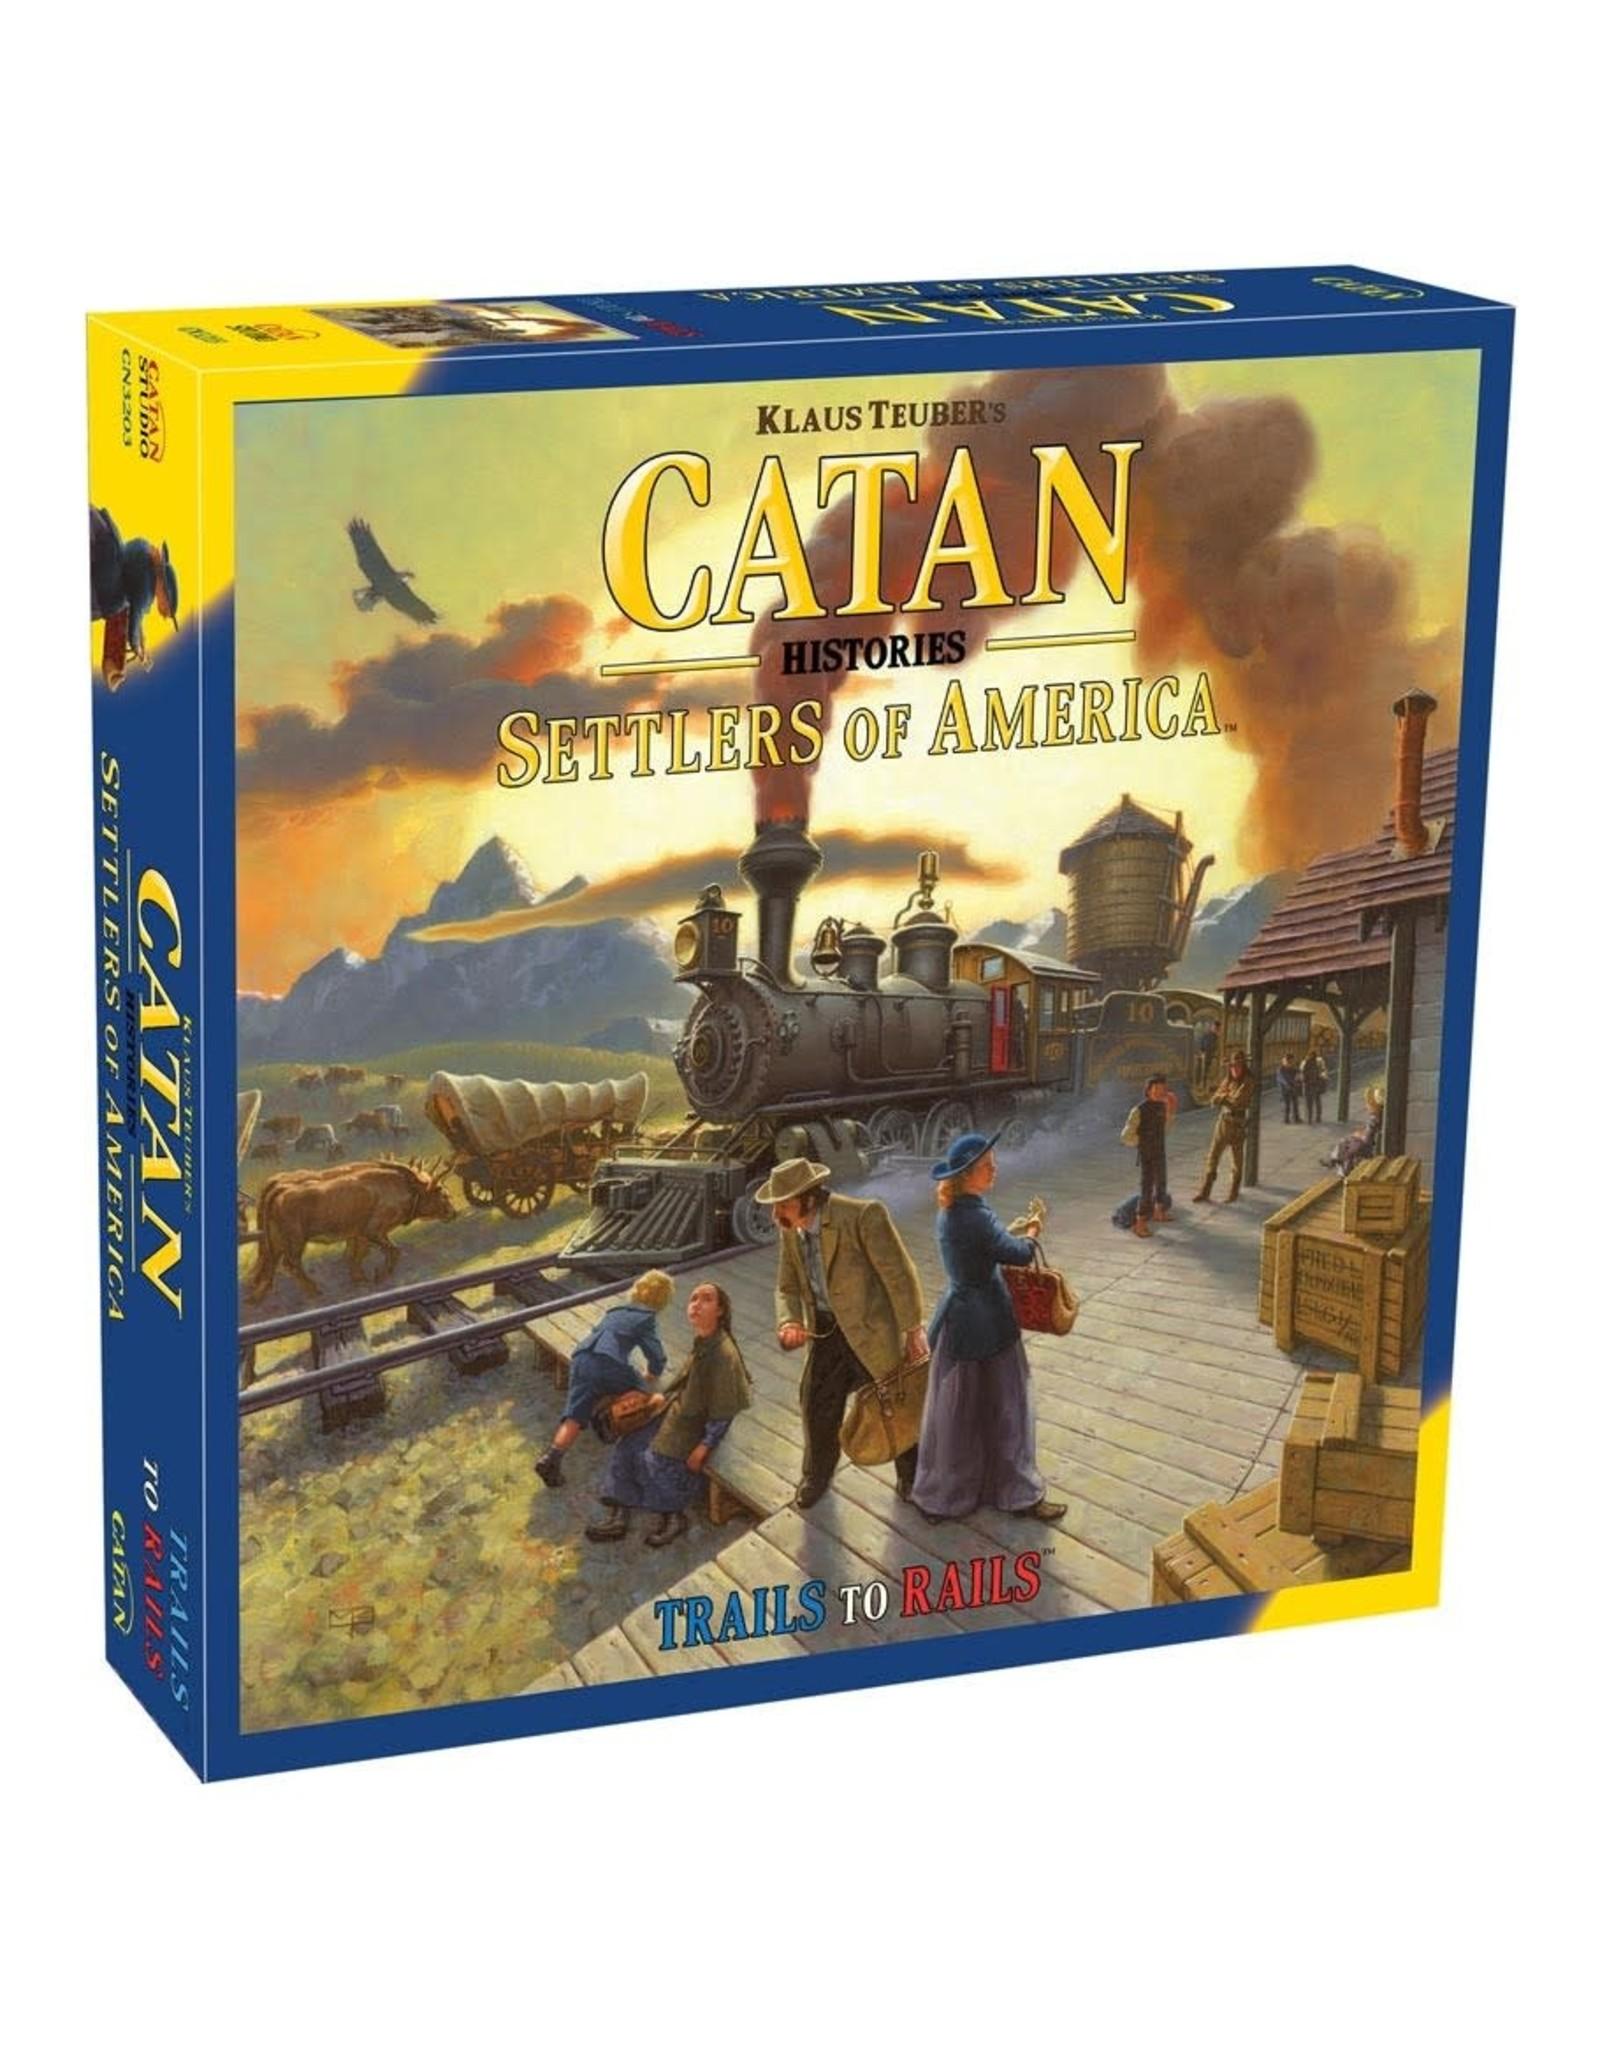 Asmodee Catan Histories: Settlers of America